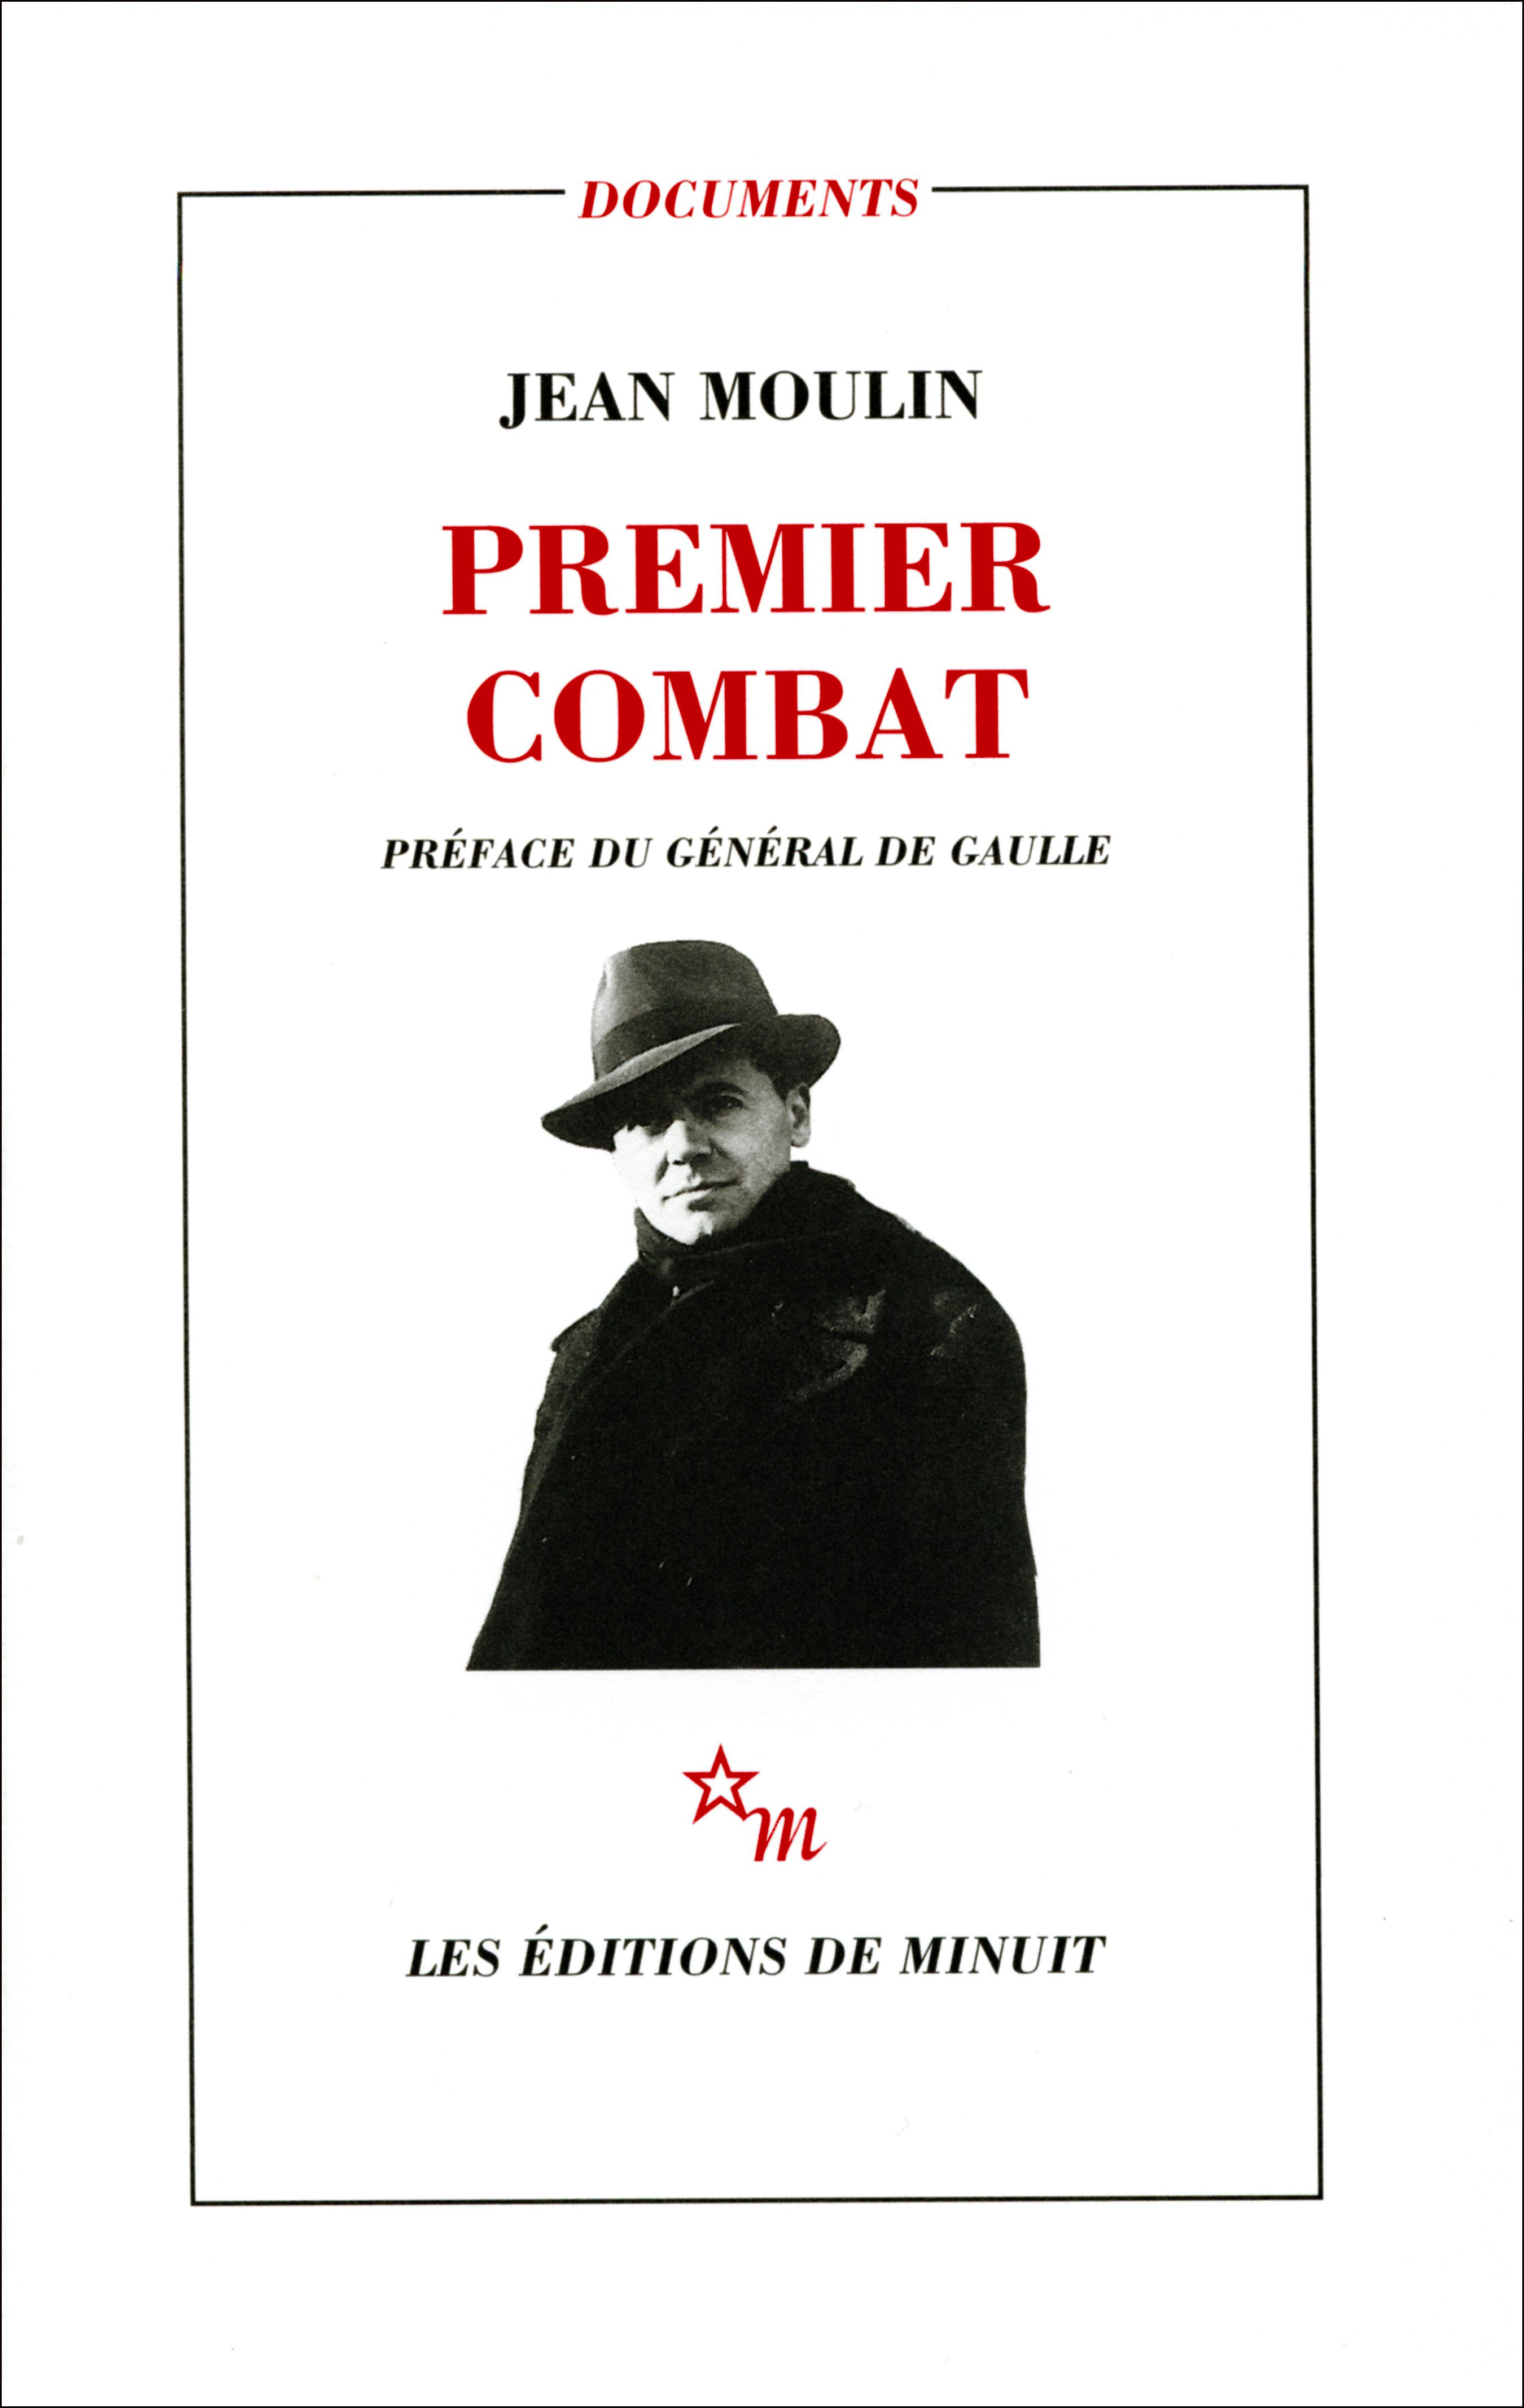 Premier combat